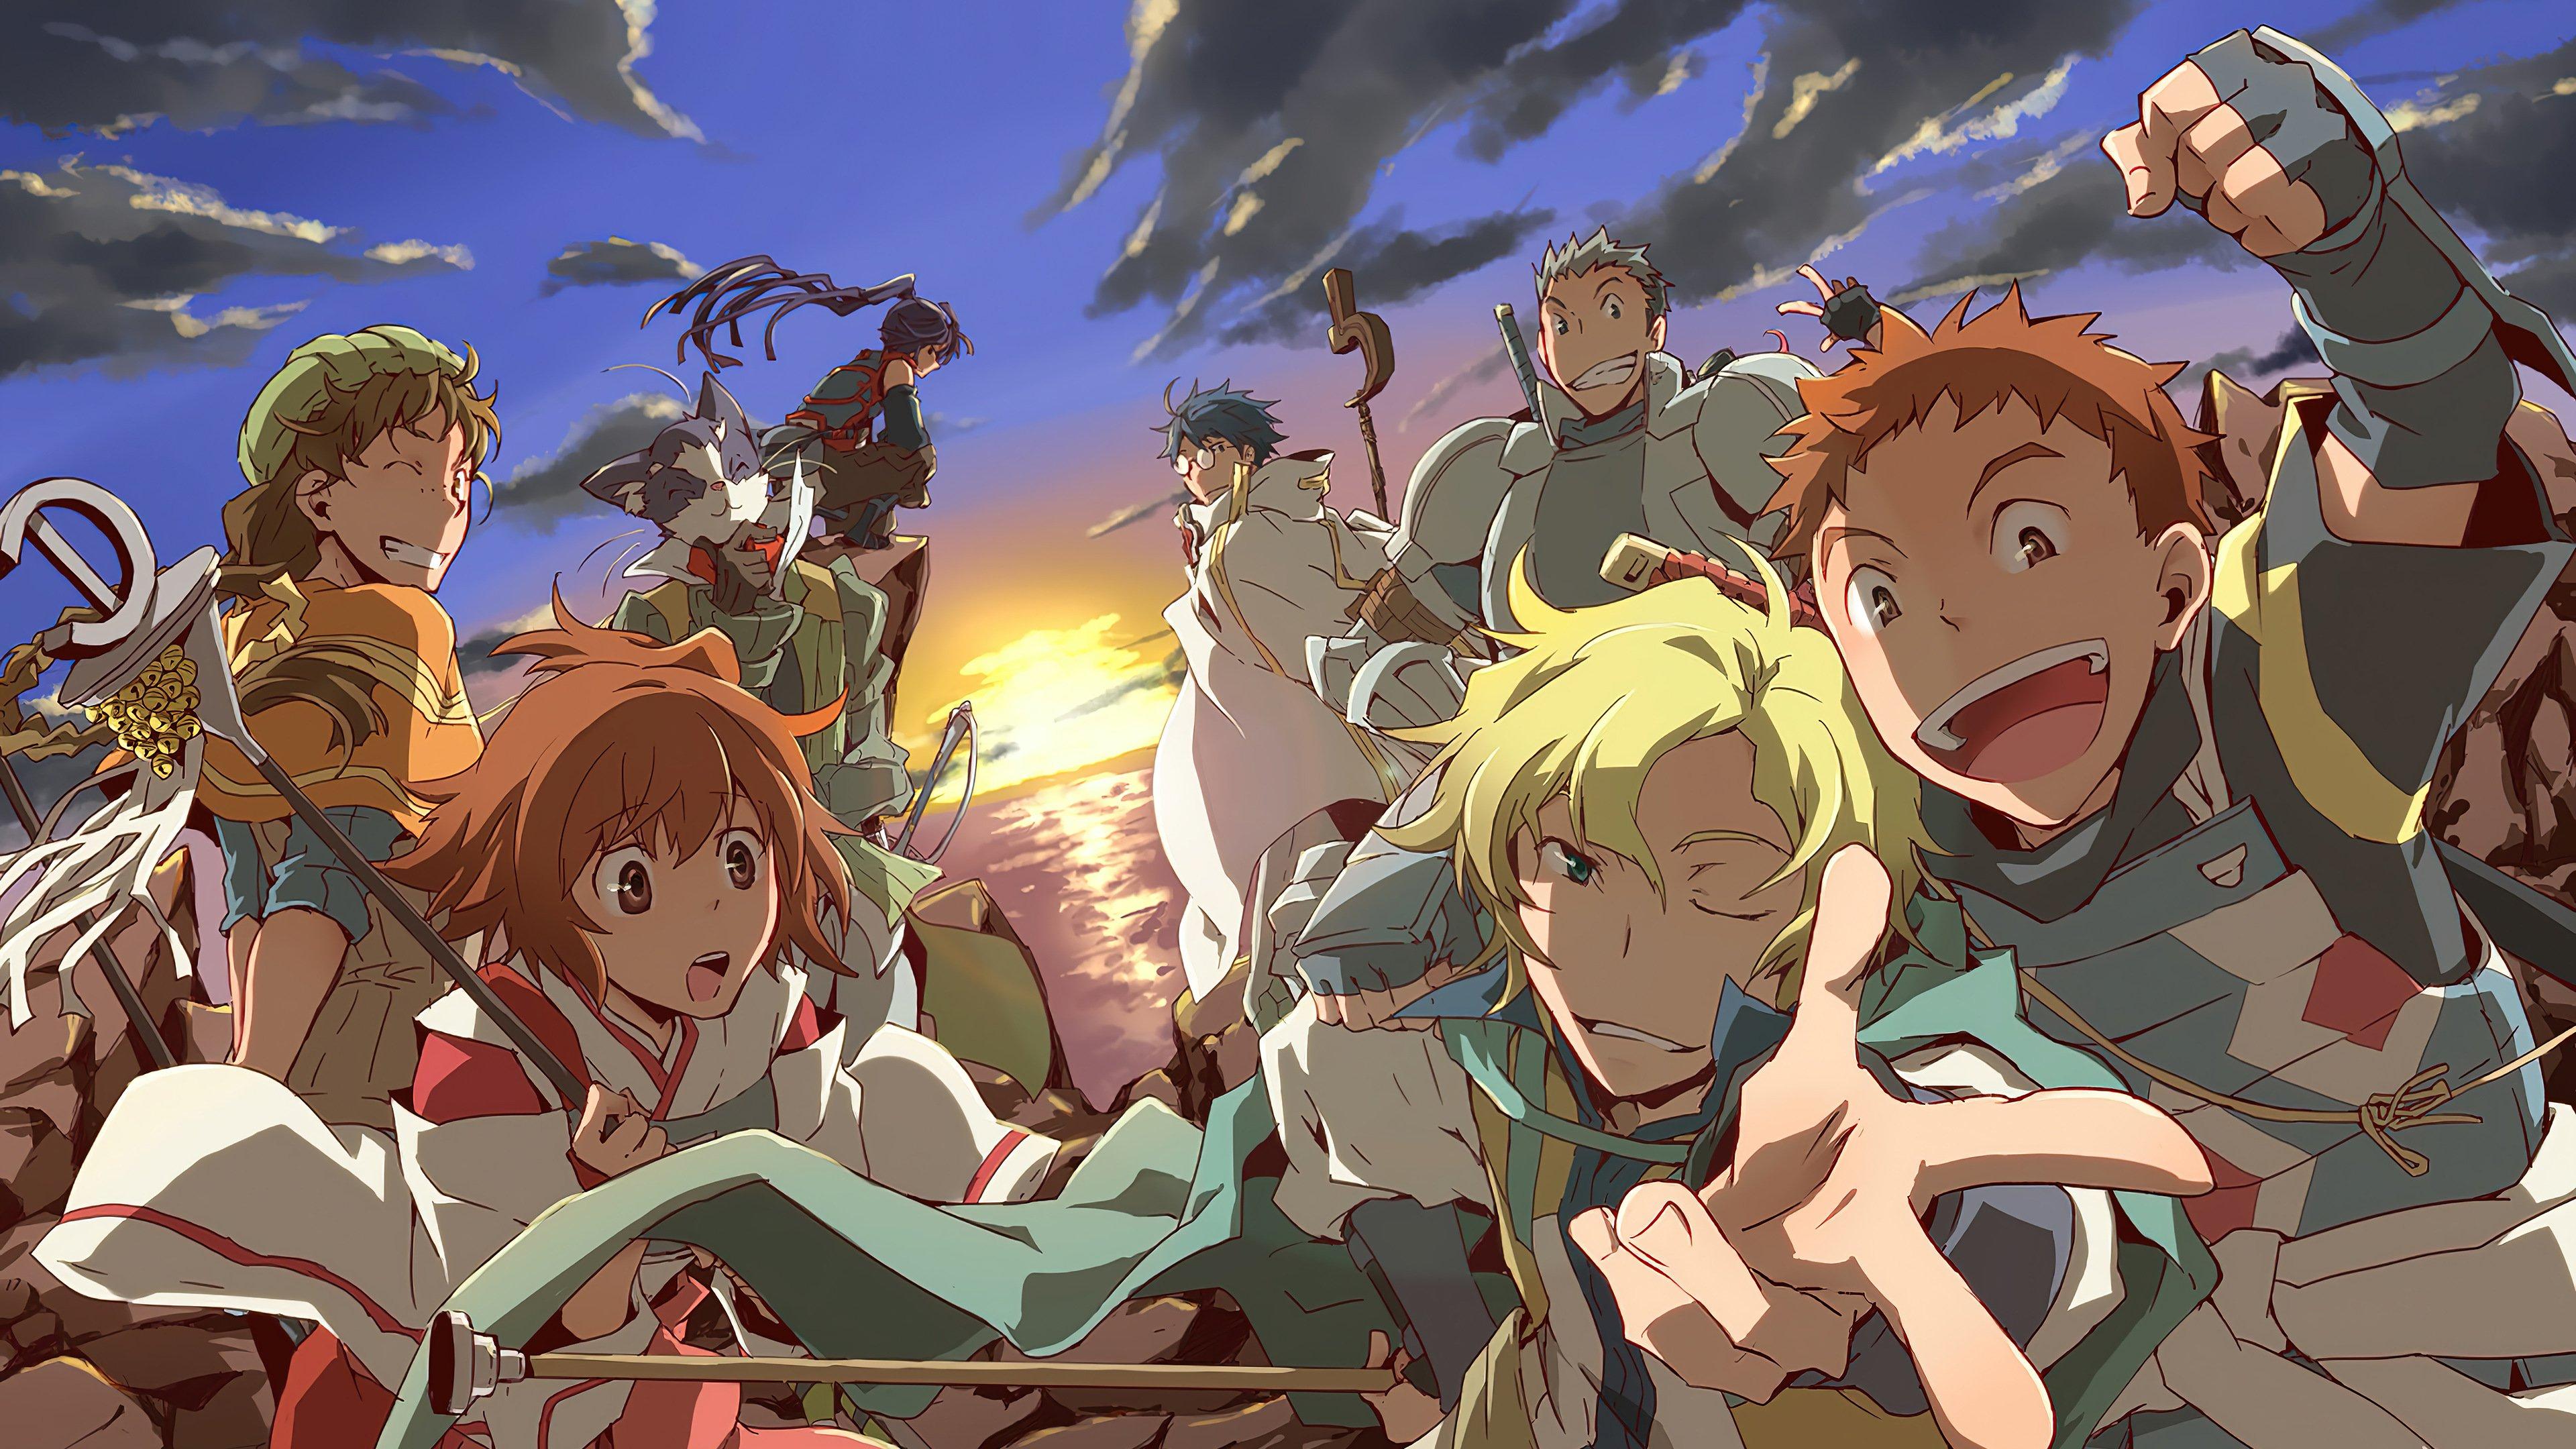 Fondos de pantalla Anime Personajes de Log Horizon